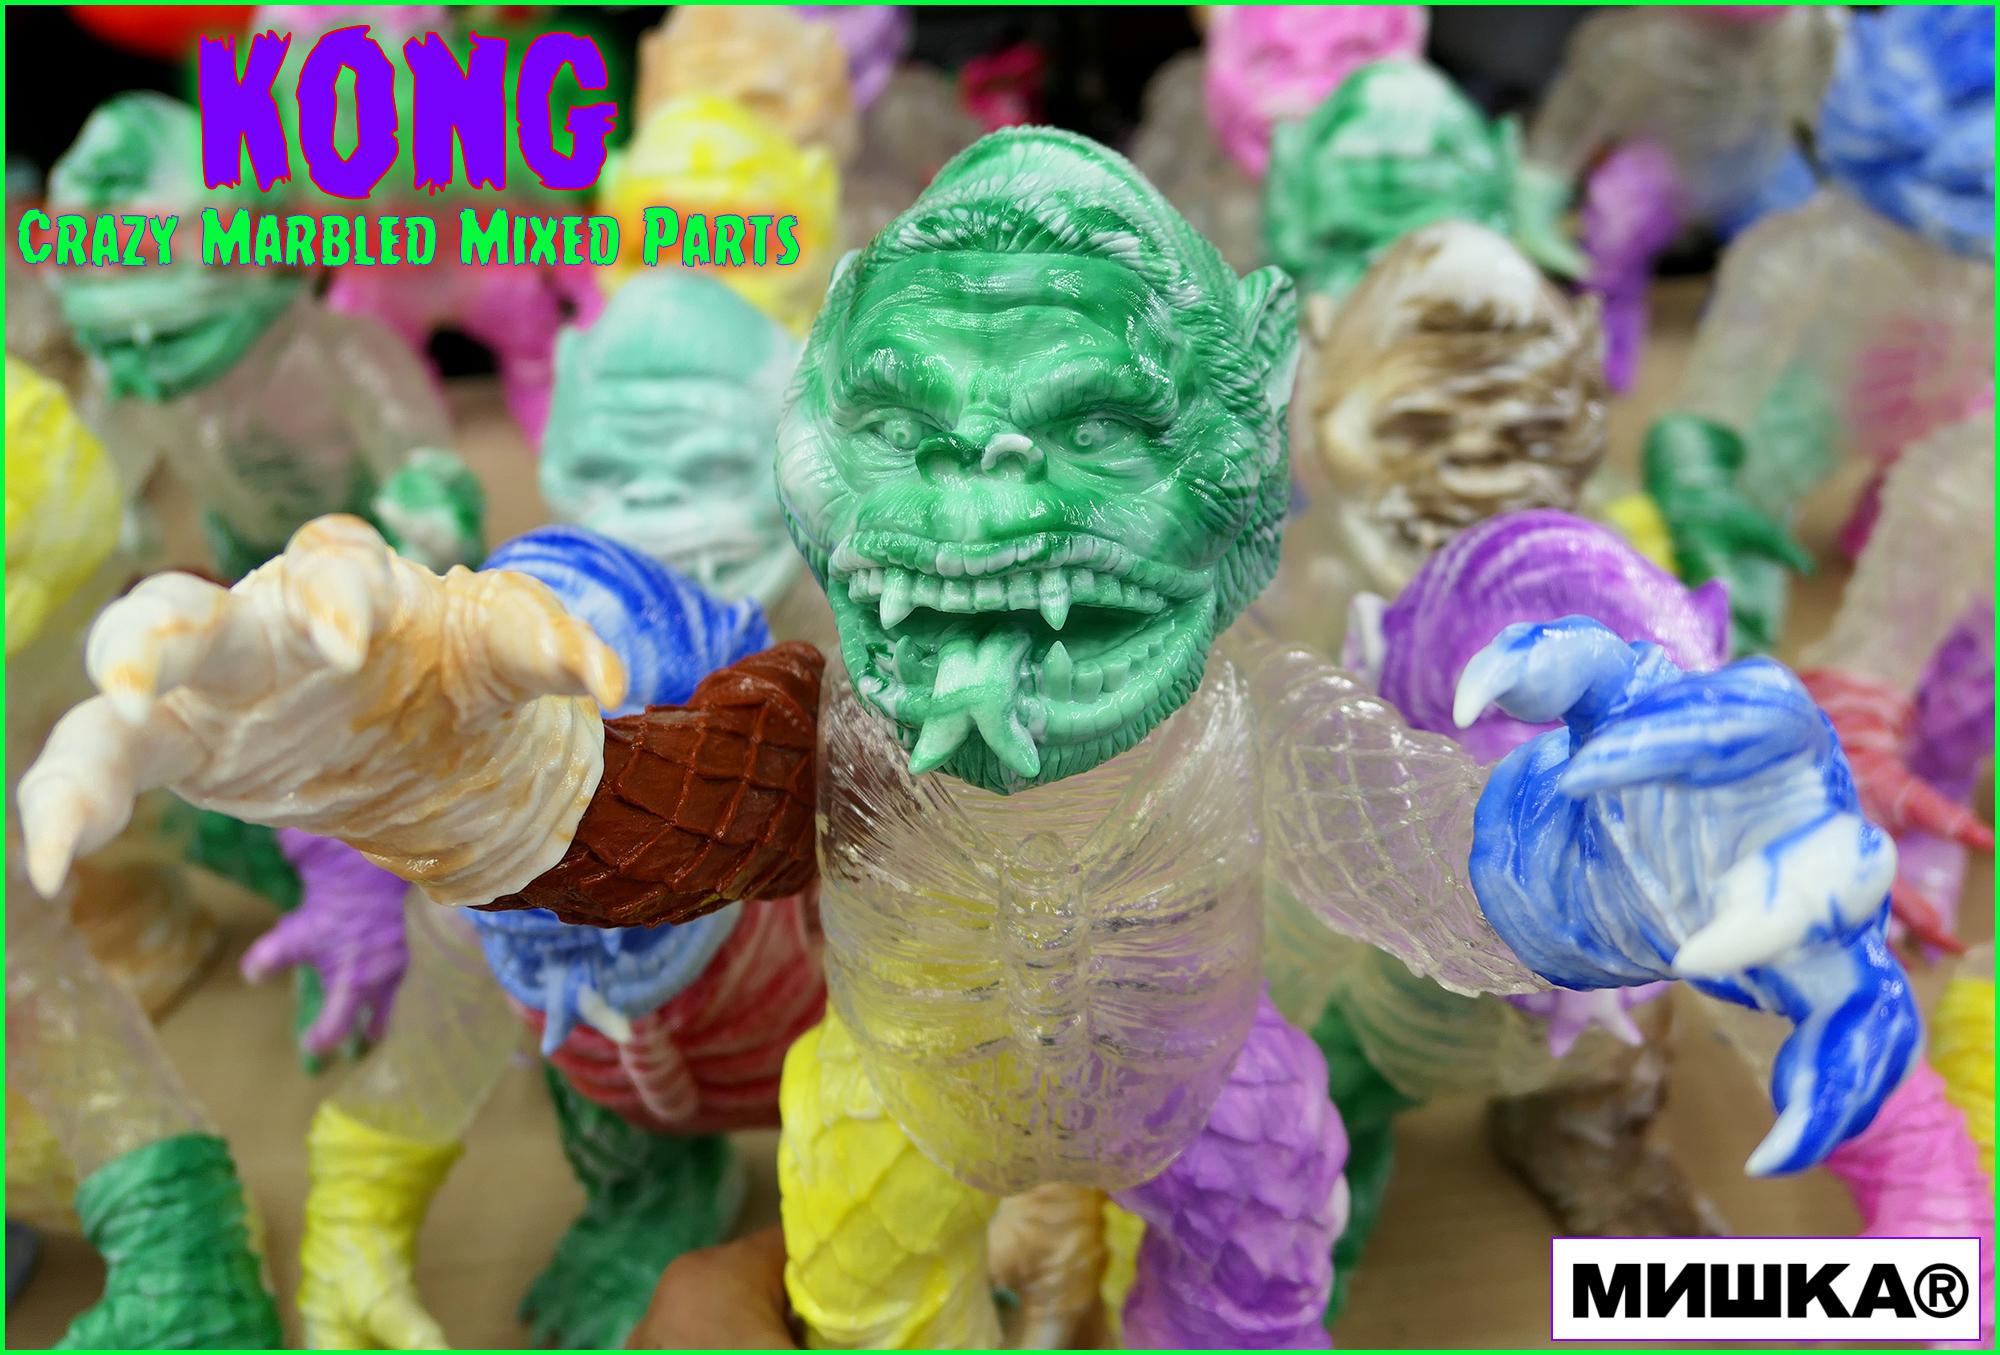 MISHKA:Crazy Marbled Mixed Parts KONG Lottery